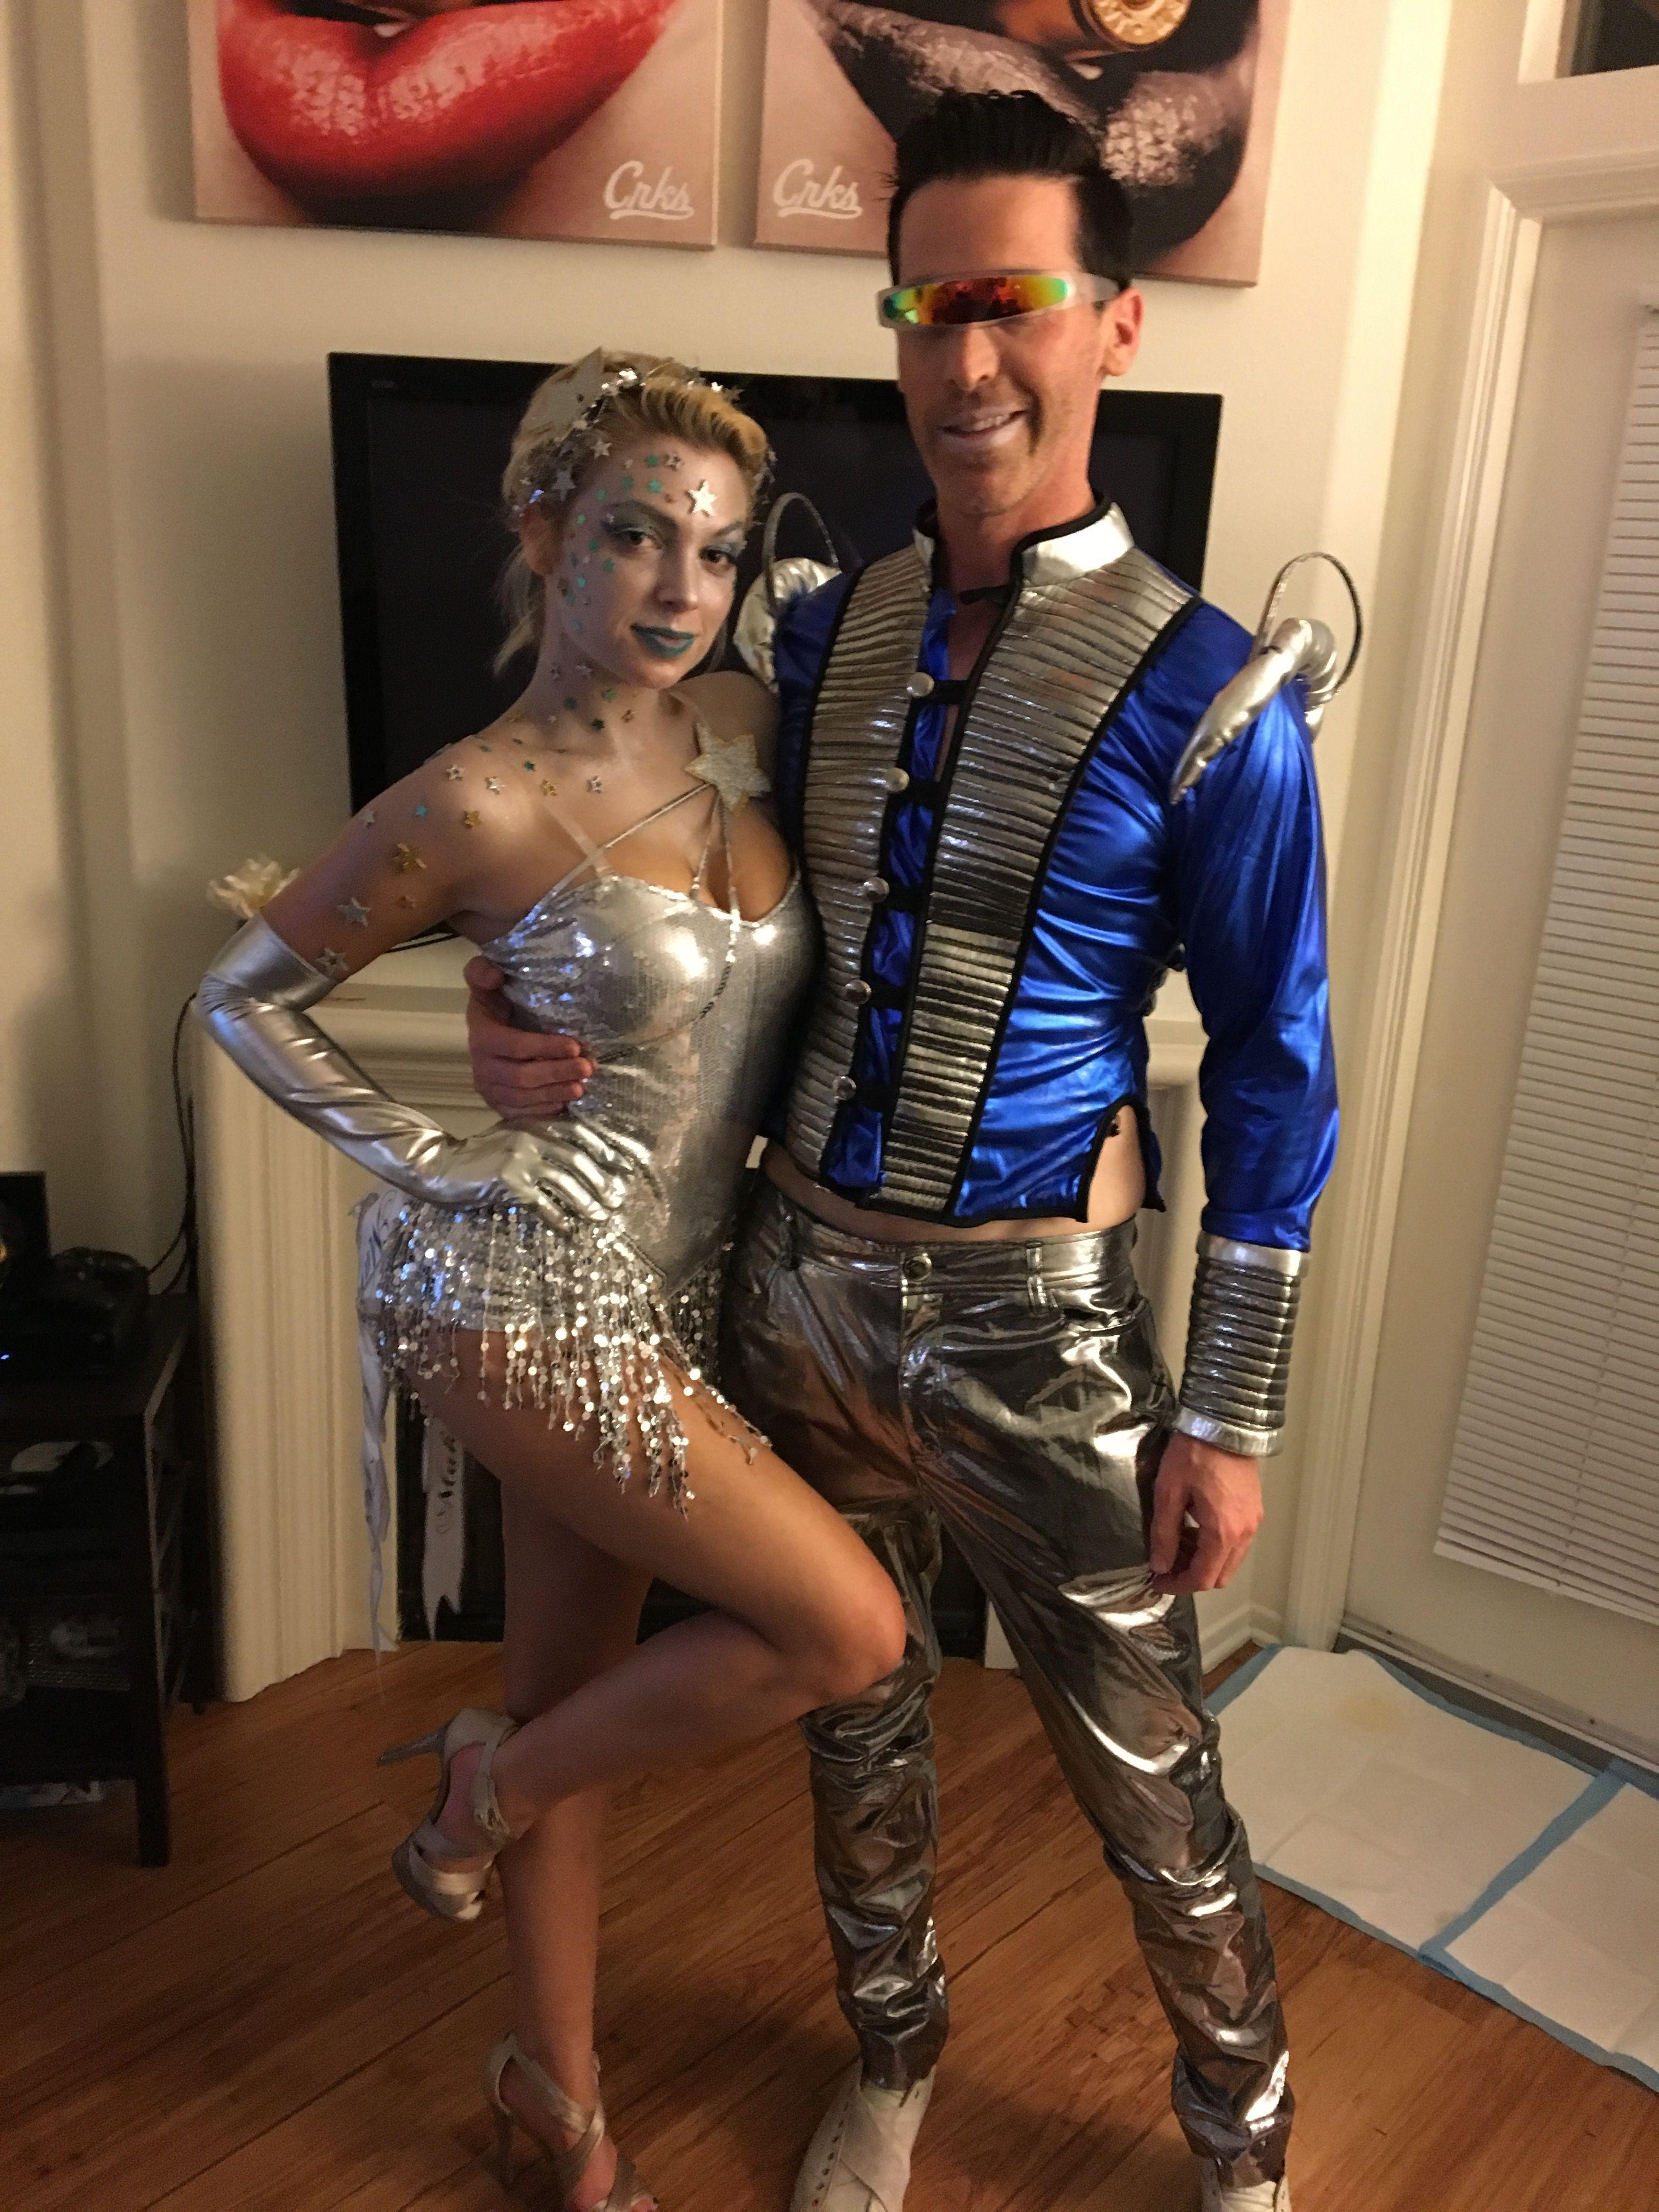 Shooting Star And Galaxy Man Couples Halloween Costume Space Man Star Couples Halloween Space Party Costumes Couple Halloween Costumes Alien Costume Women